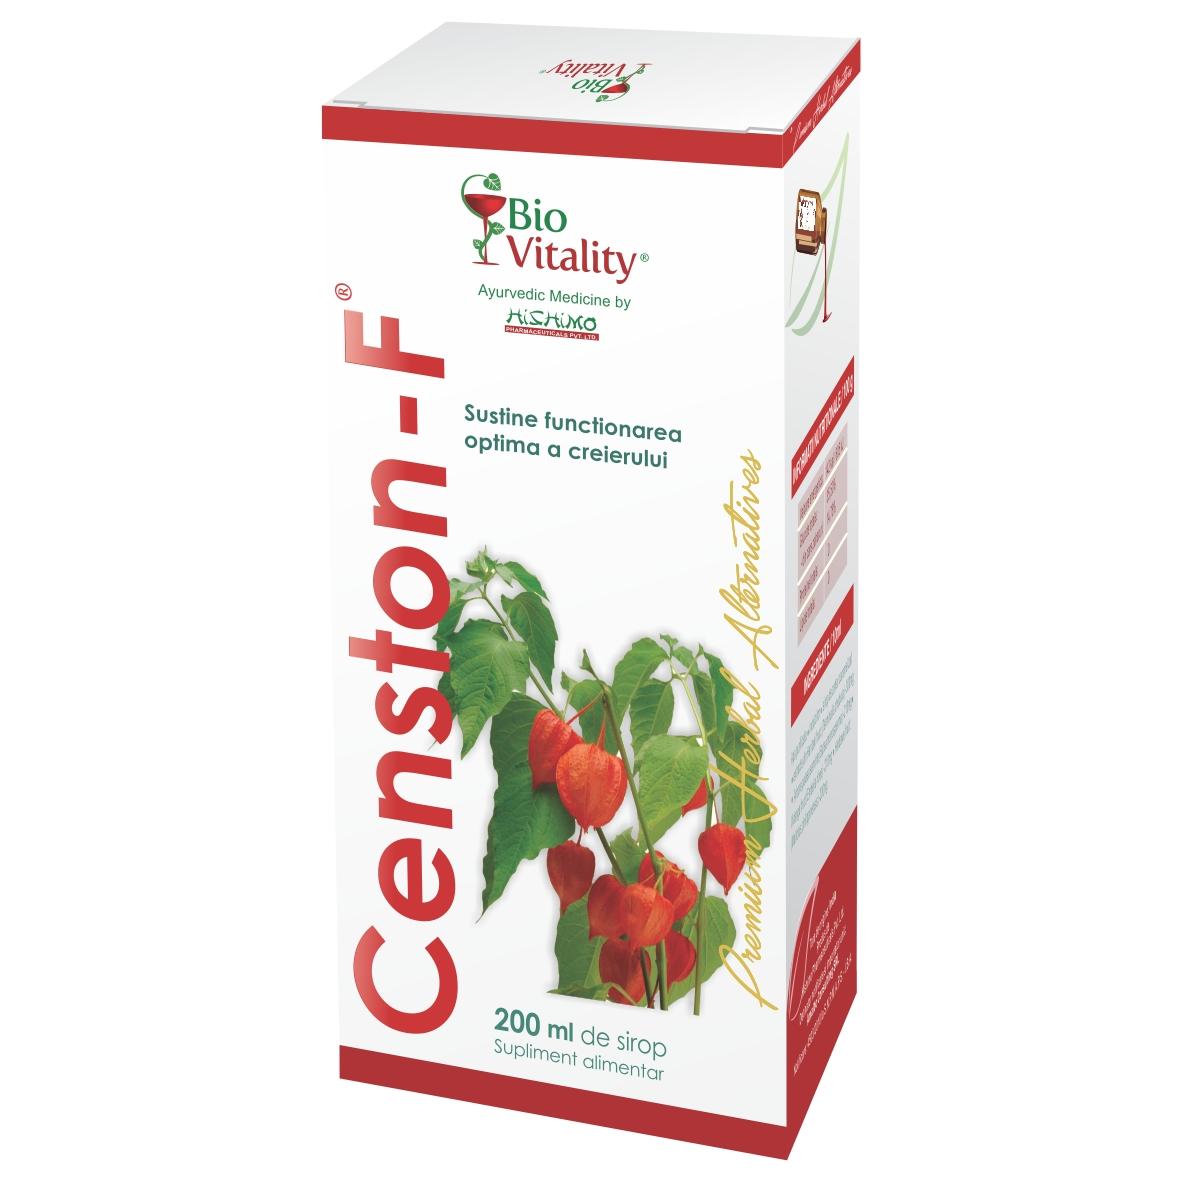 Censton-F Sirop, 200 ml, Bio Vitality